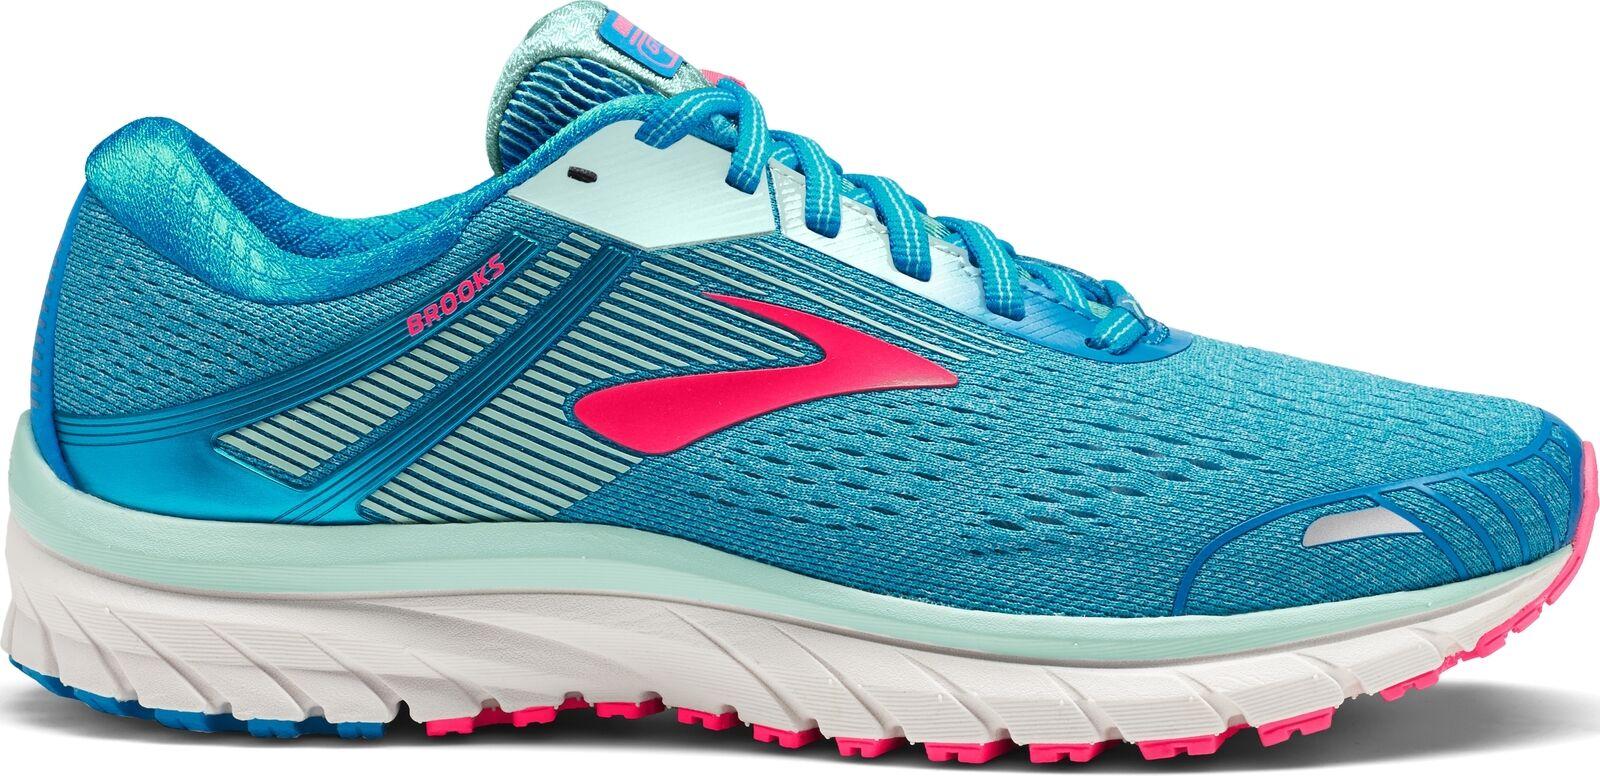 Brooks adrenaline gts 18 womens  running shoes-bluee  very popular